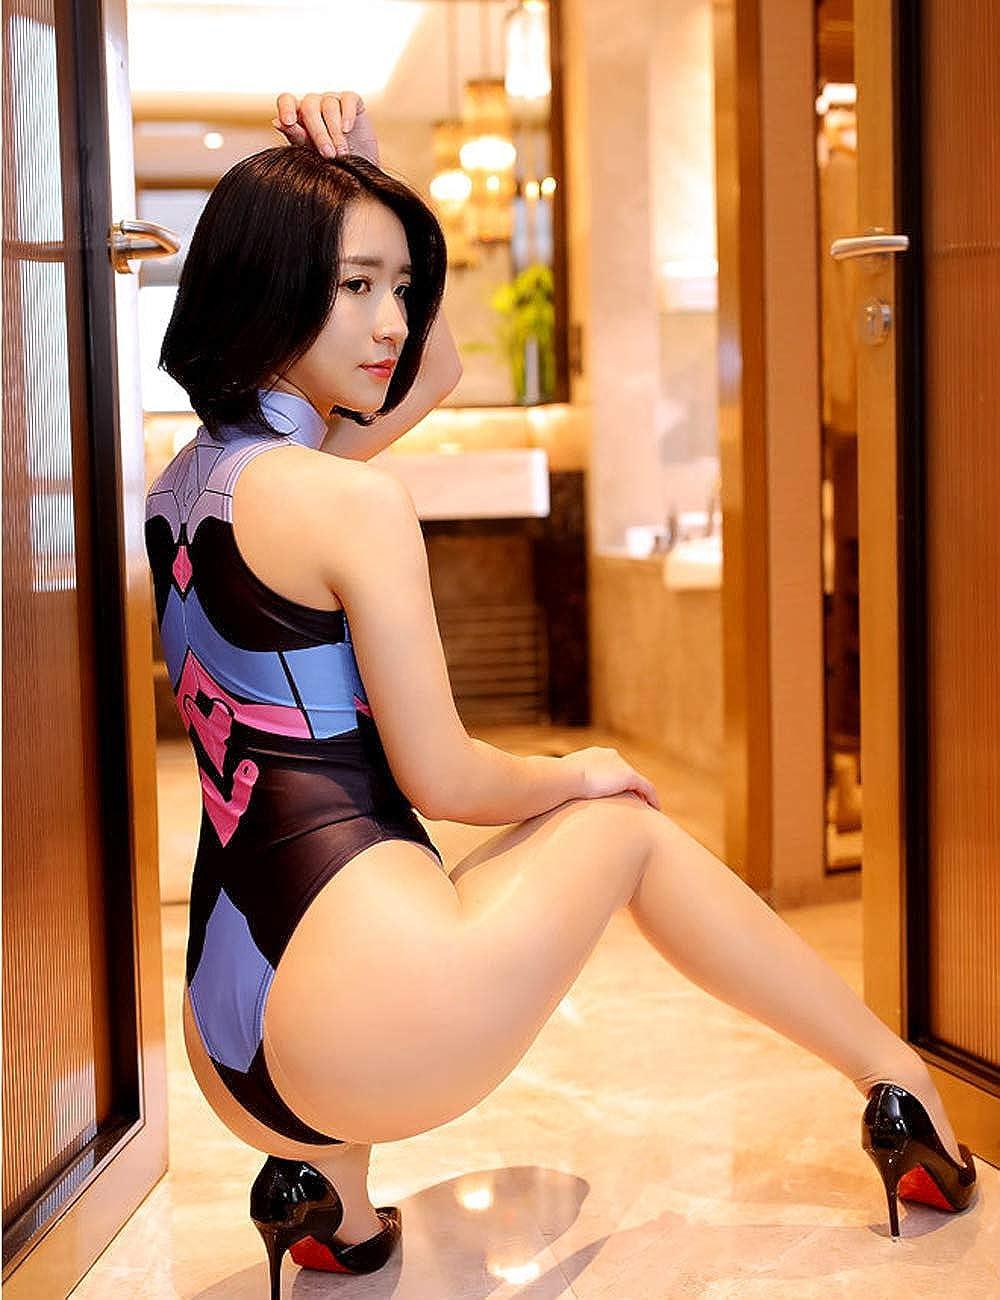 Lucky2Buy Womens Cute D.va Cosplay High Cut Leotard Lingerie One-Piece Bodysuit Teddy